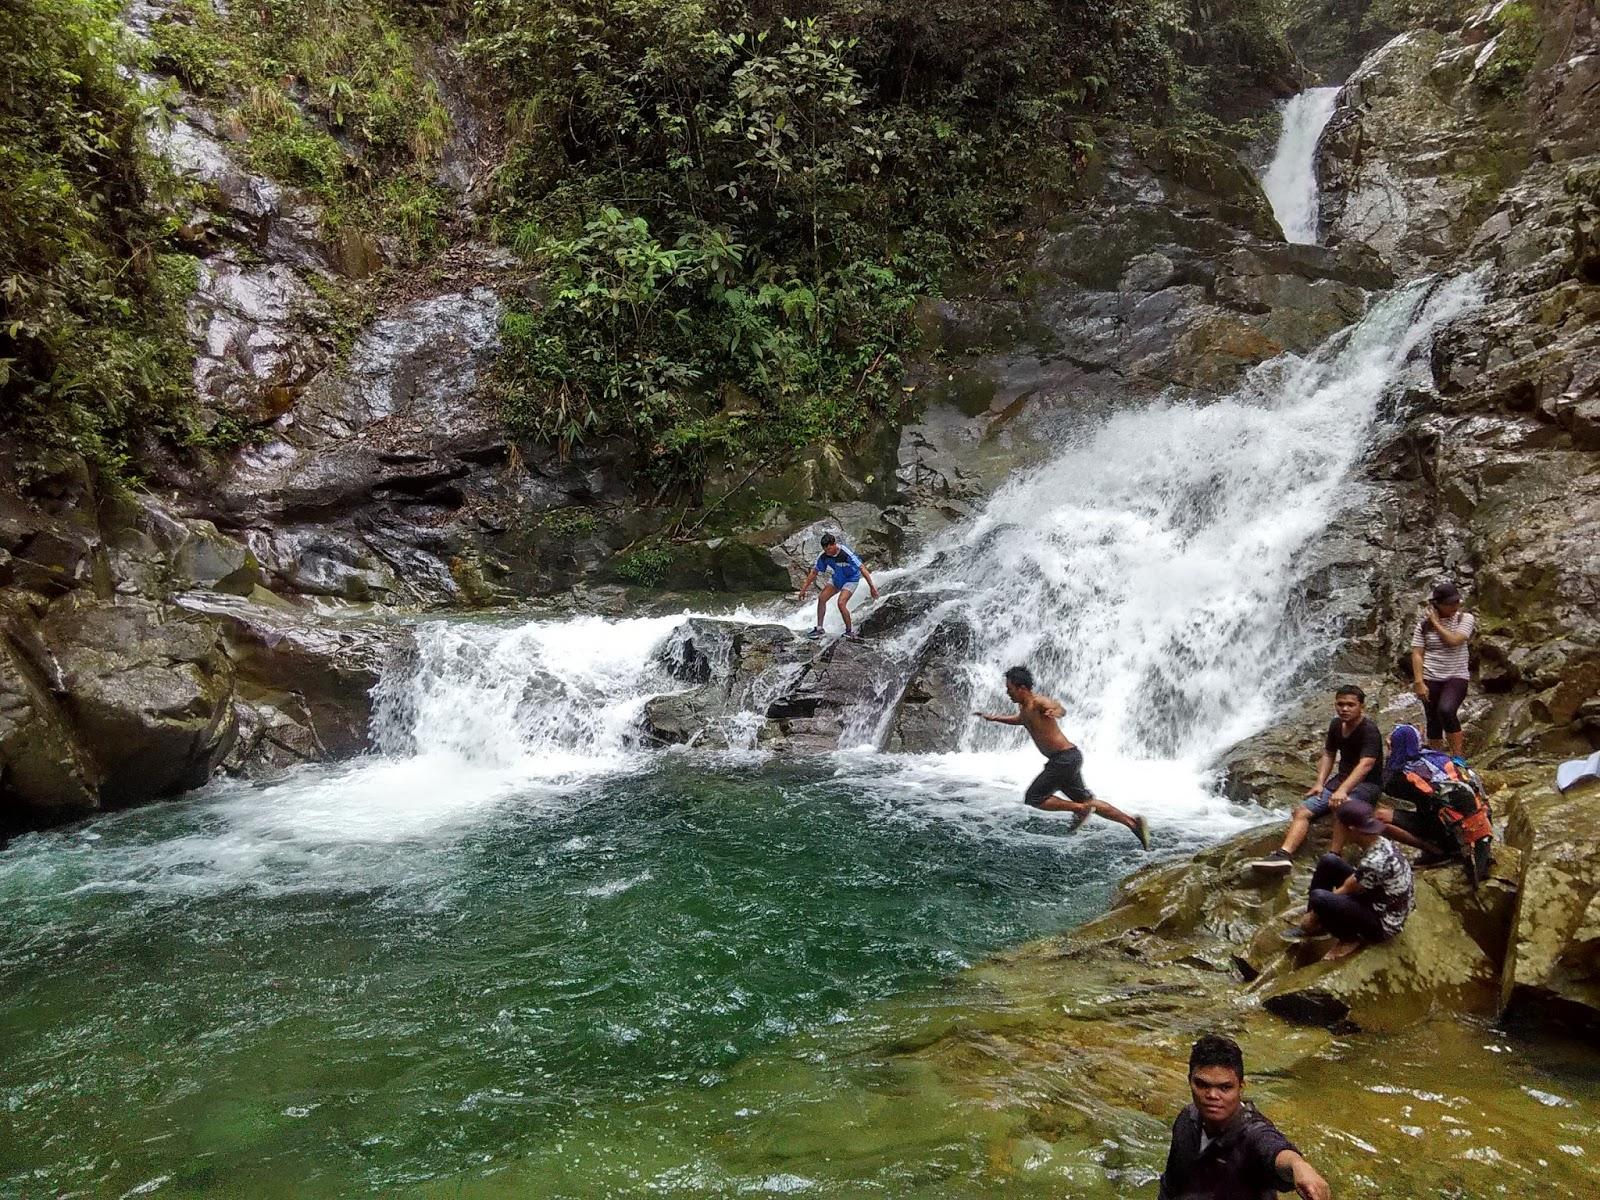 Petualangan Menuju Air Terjun Simempar - Badia Tarigan ...